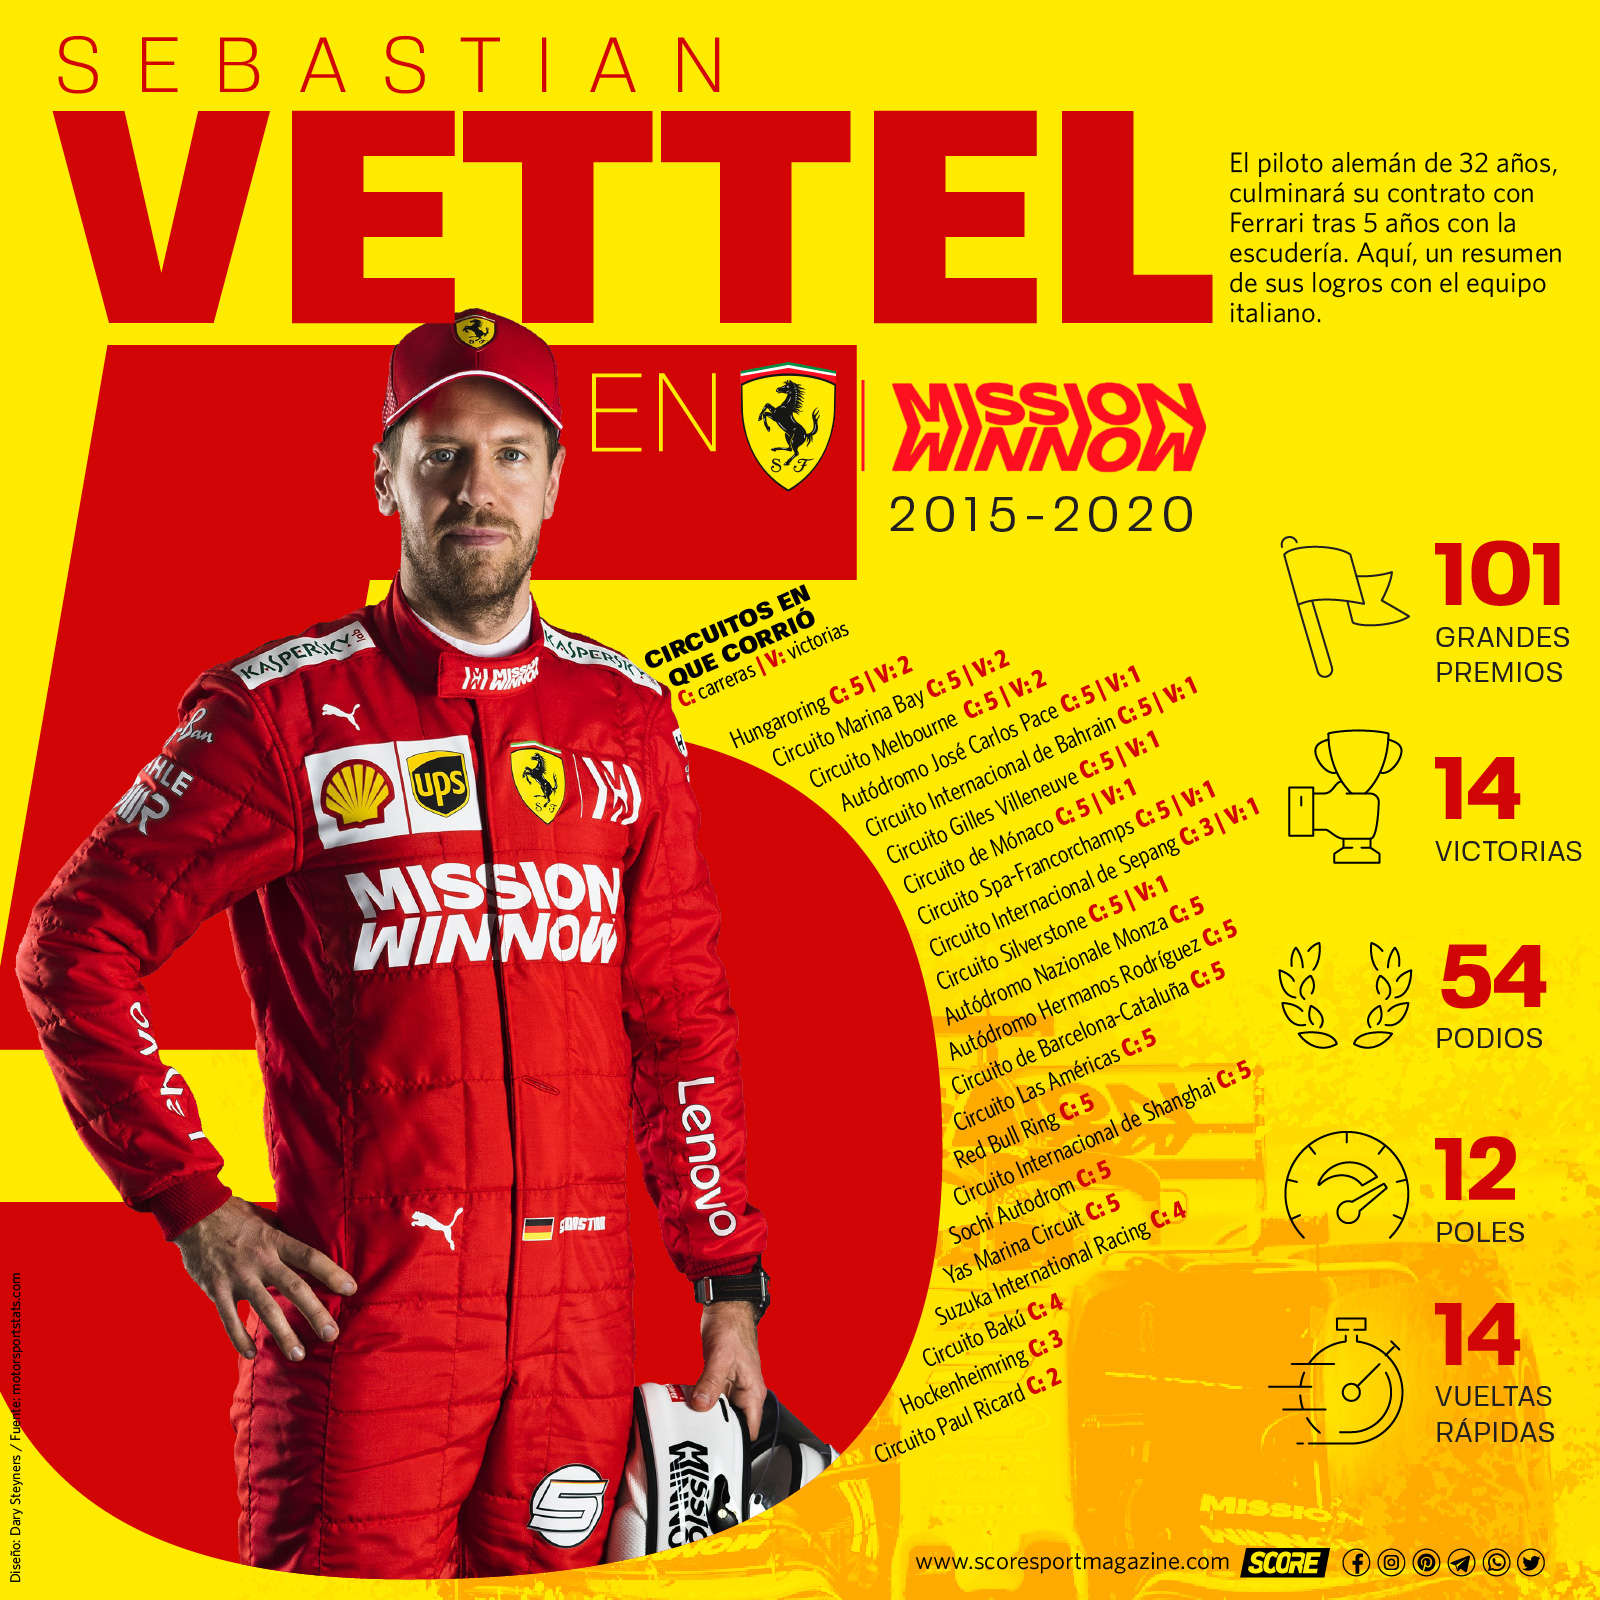 Logros de Sebastian Vettel en Ferrari